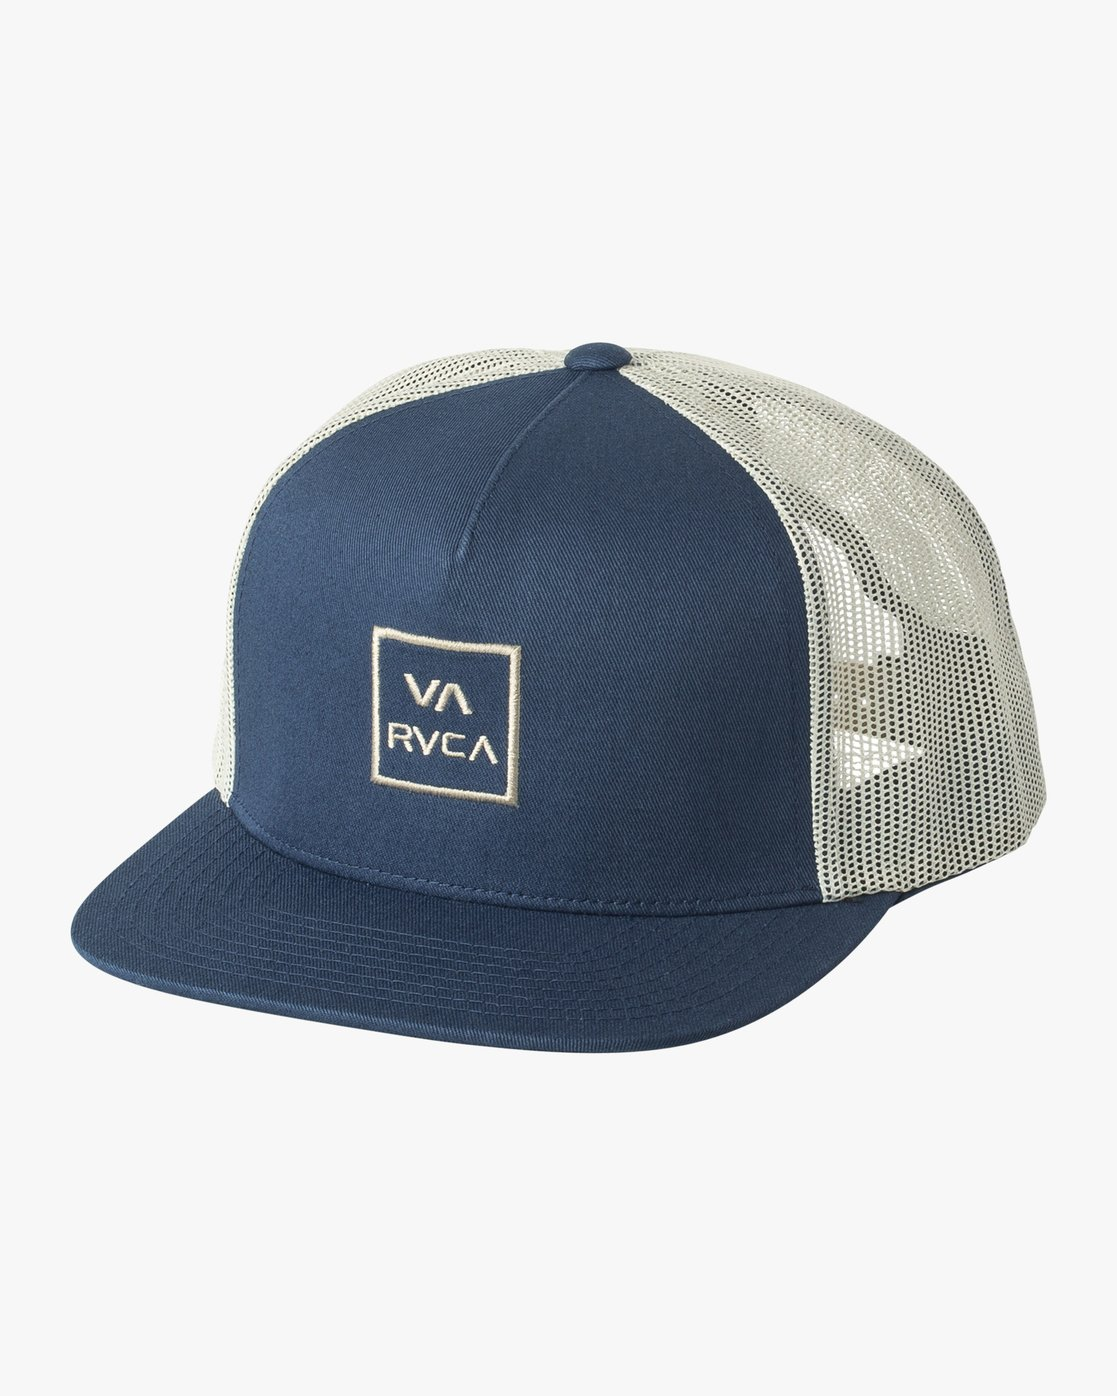 0 VA All The Way Trucker Hat III Blue MAAHWVWY RVCA